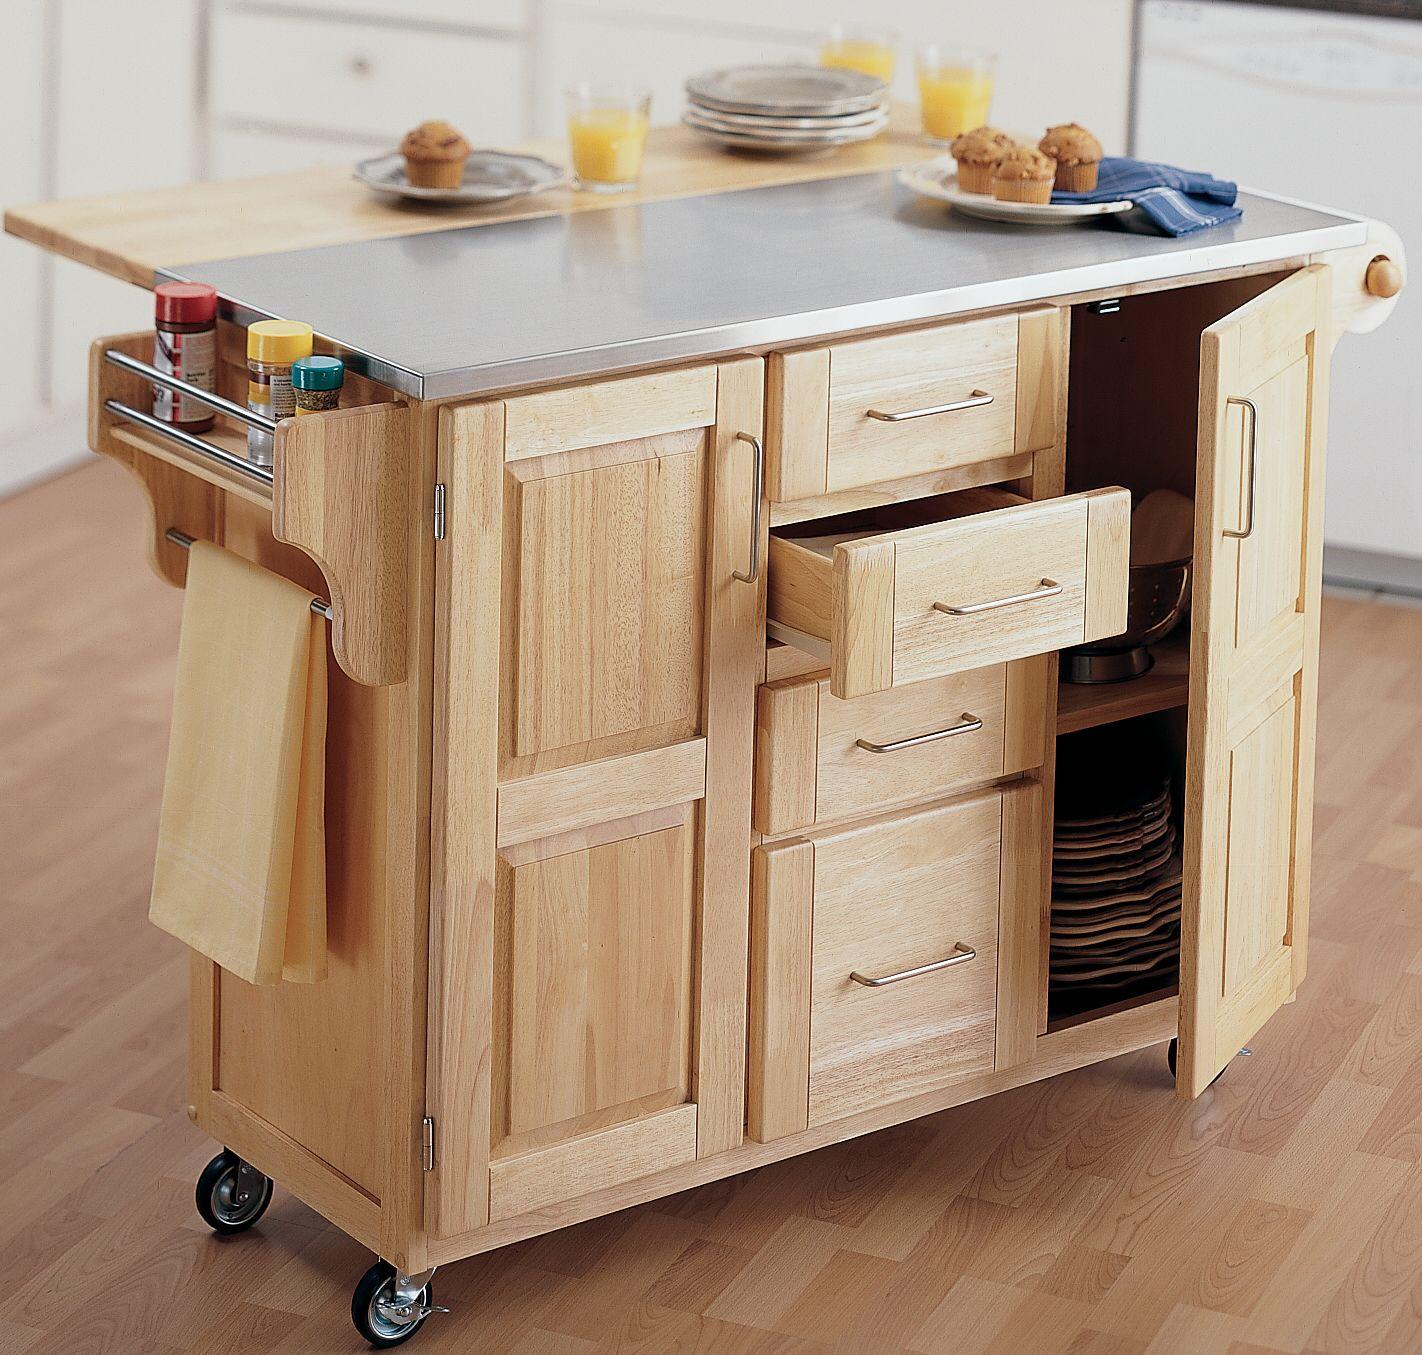 Kitchen island plans uk - Rolling Kitchen Island Images Best Design And Inspiration